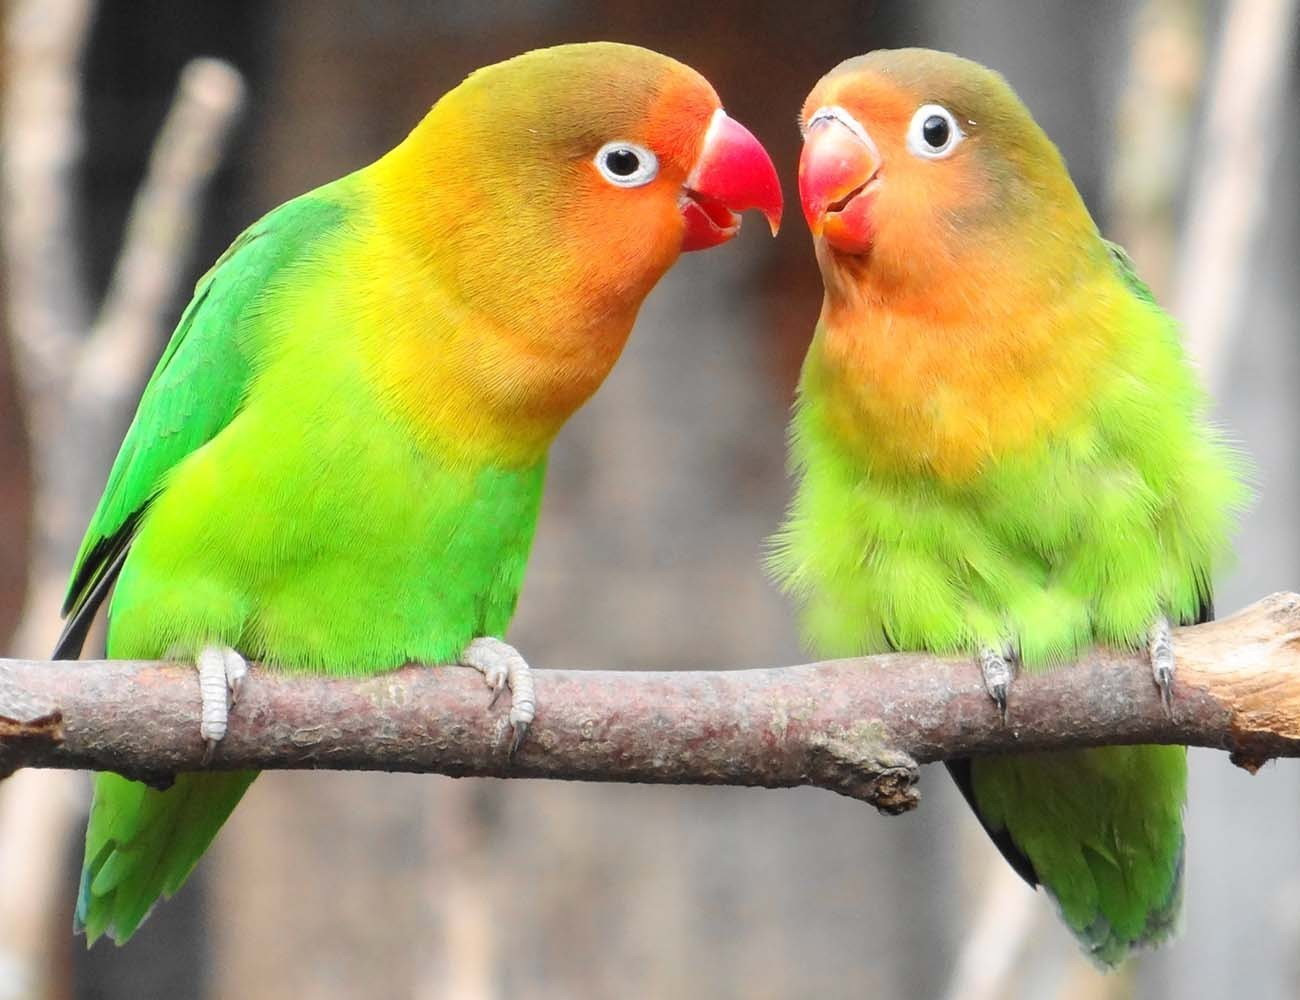 Menjodohkan Lovebird secara Pasangan